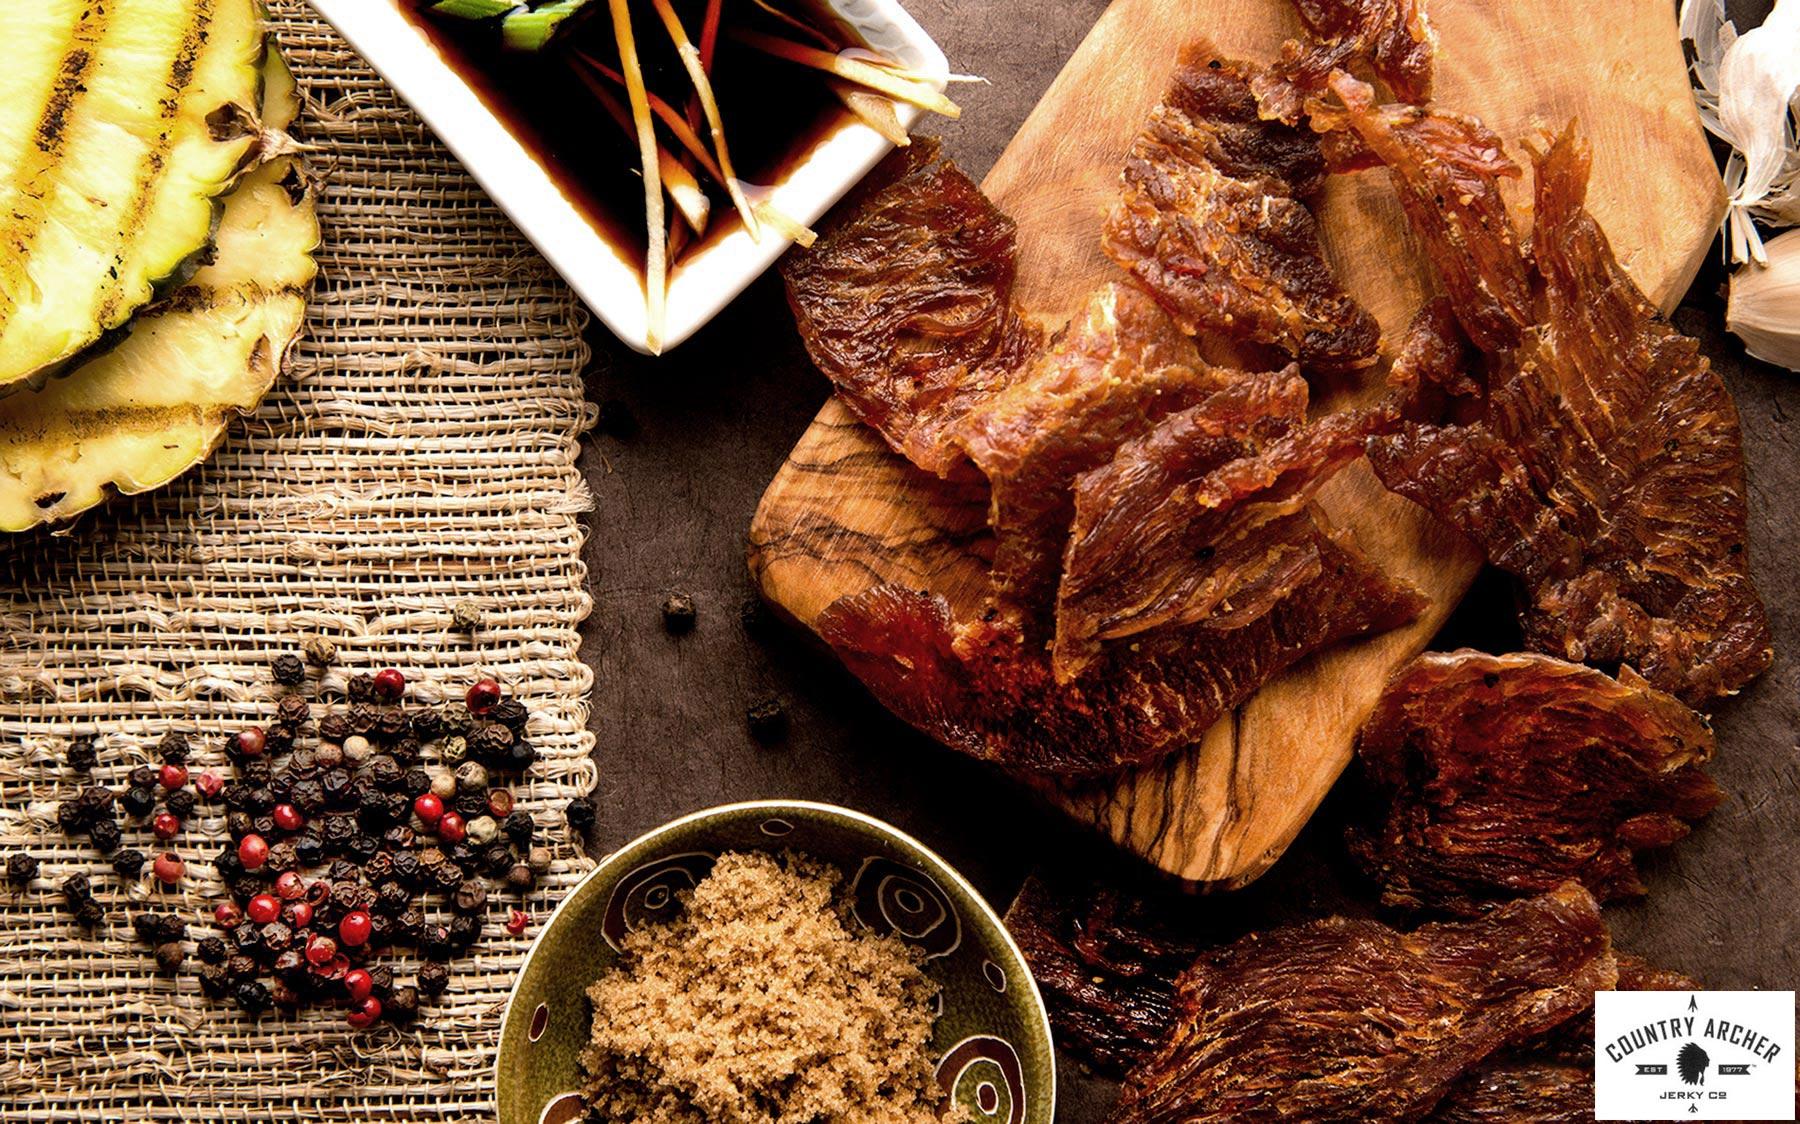 Jerky Turkey-Carl Kravats Food Photography